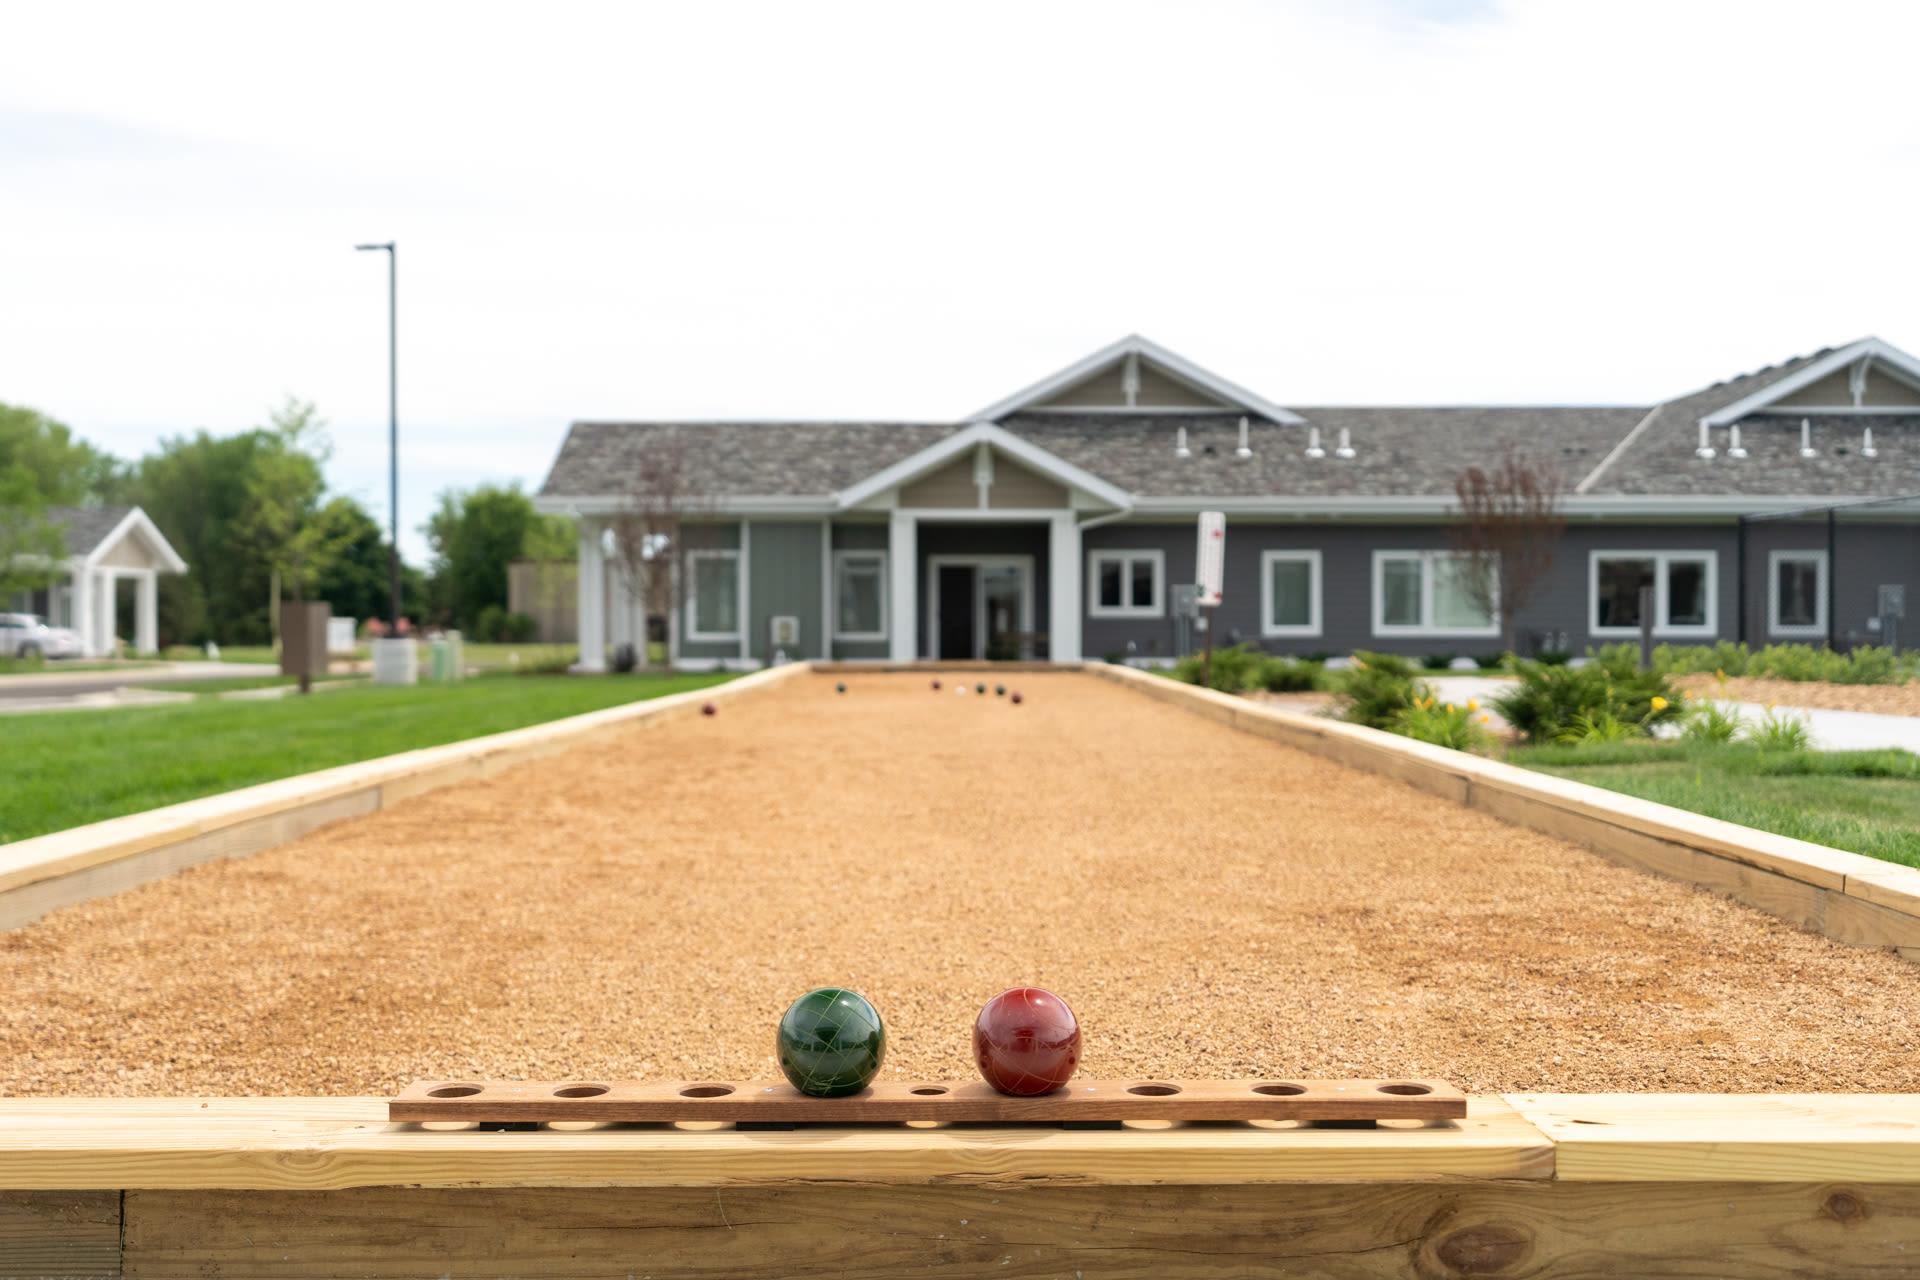 Pickle ball court at The Fields at Arbor Glen in Lake Elmo, Minnesota